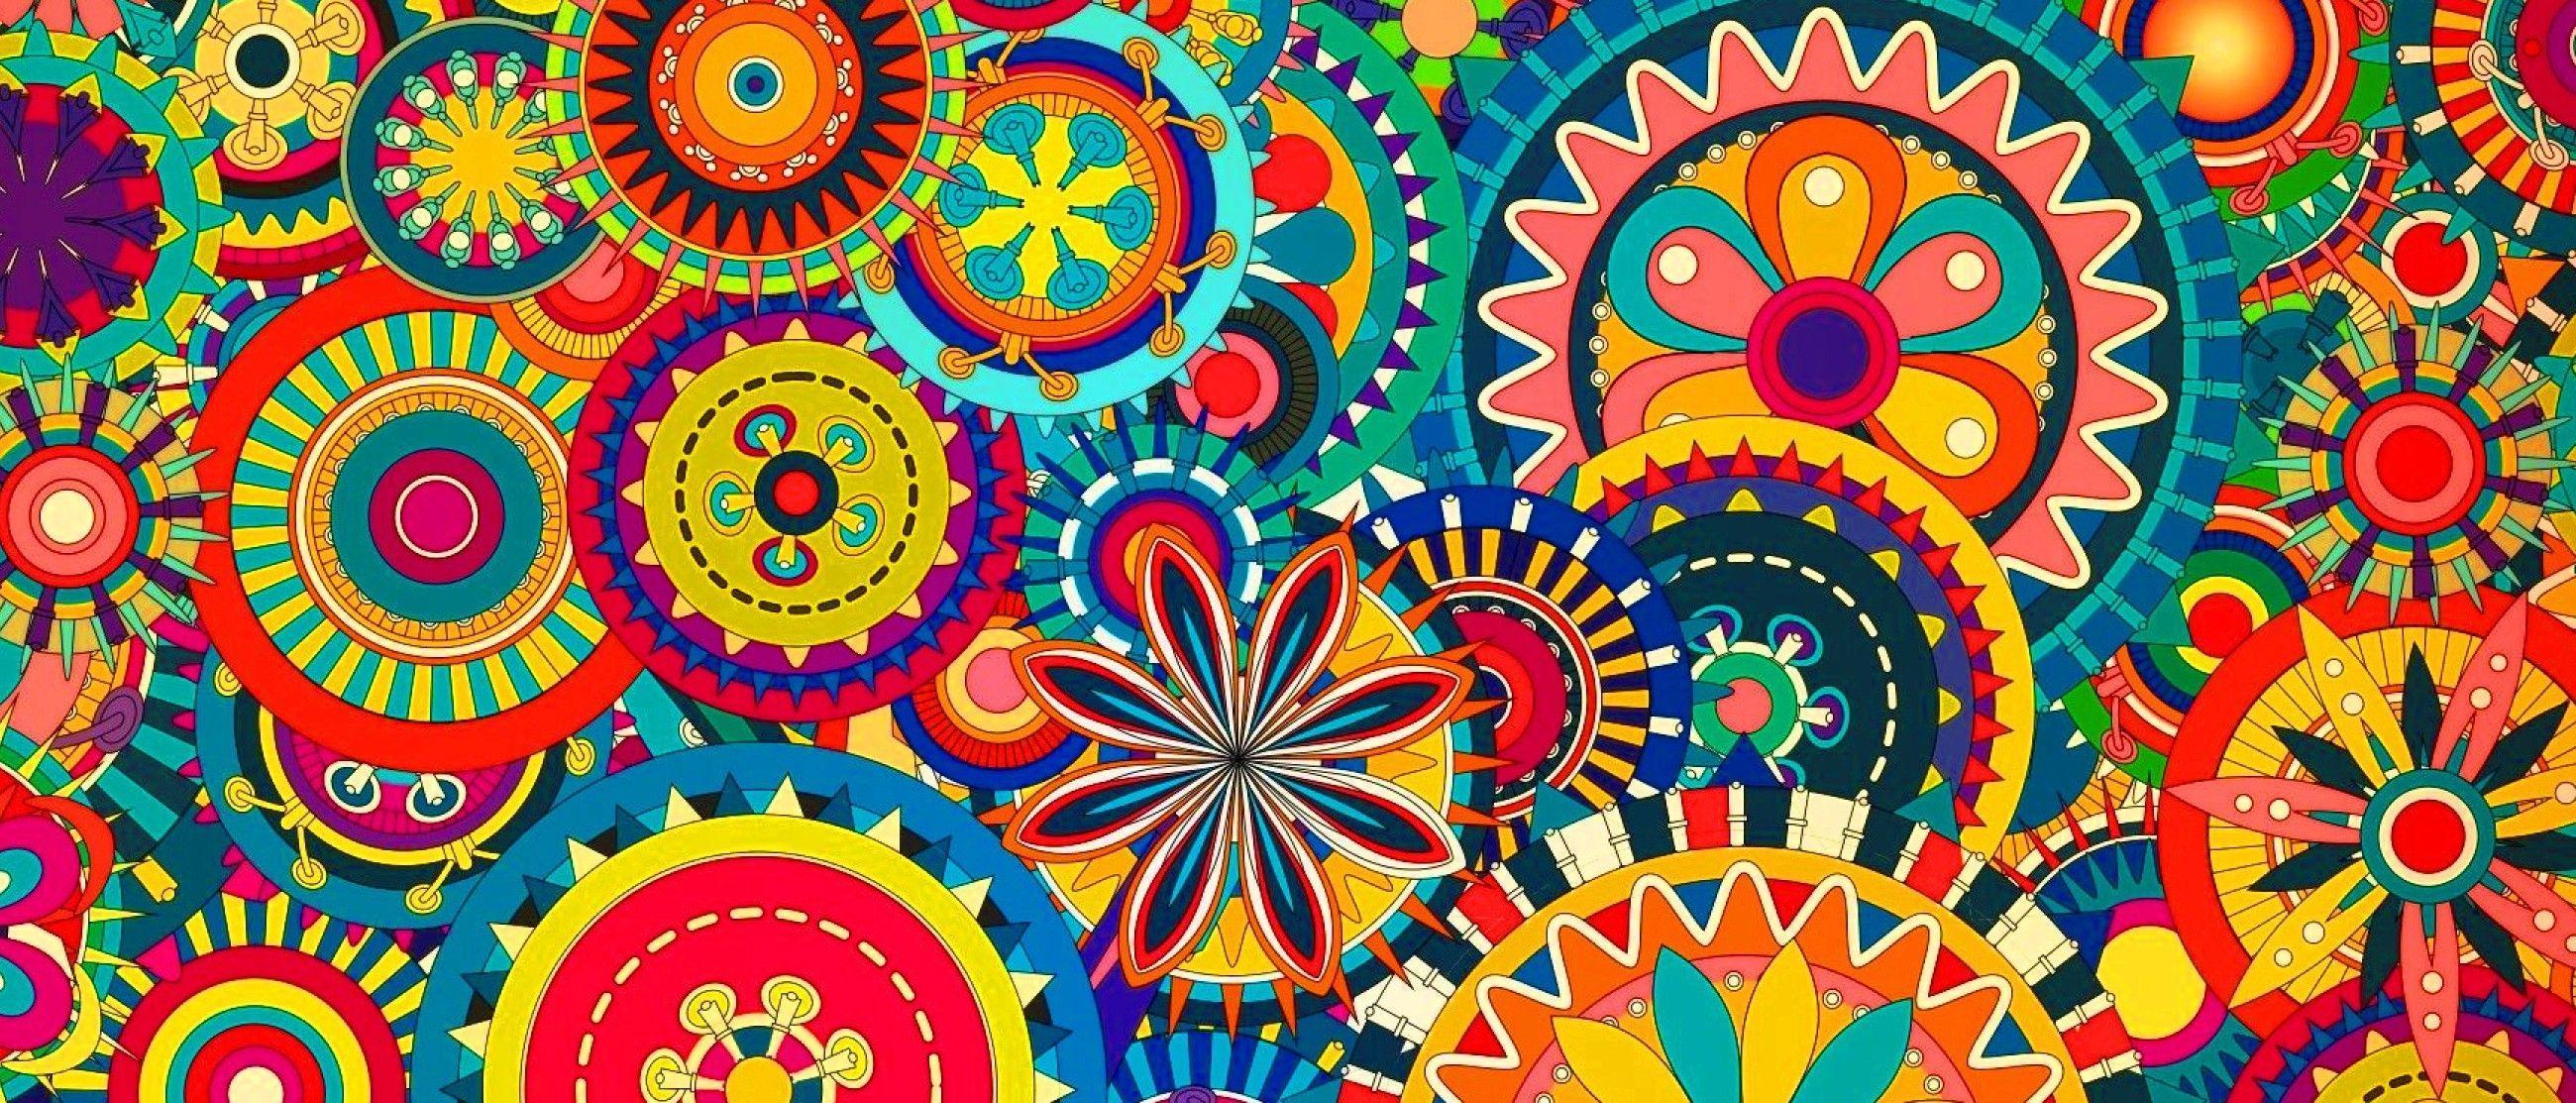 India Art Wallpapers - Wallpaper Cave